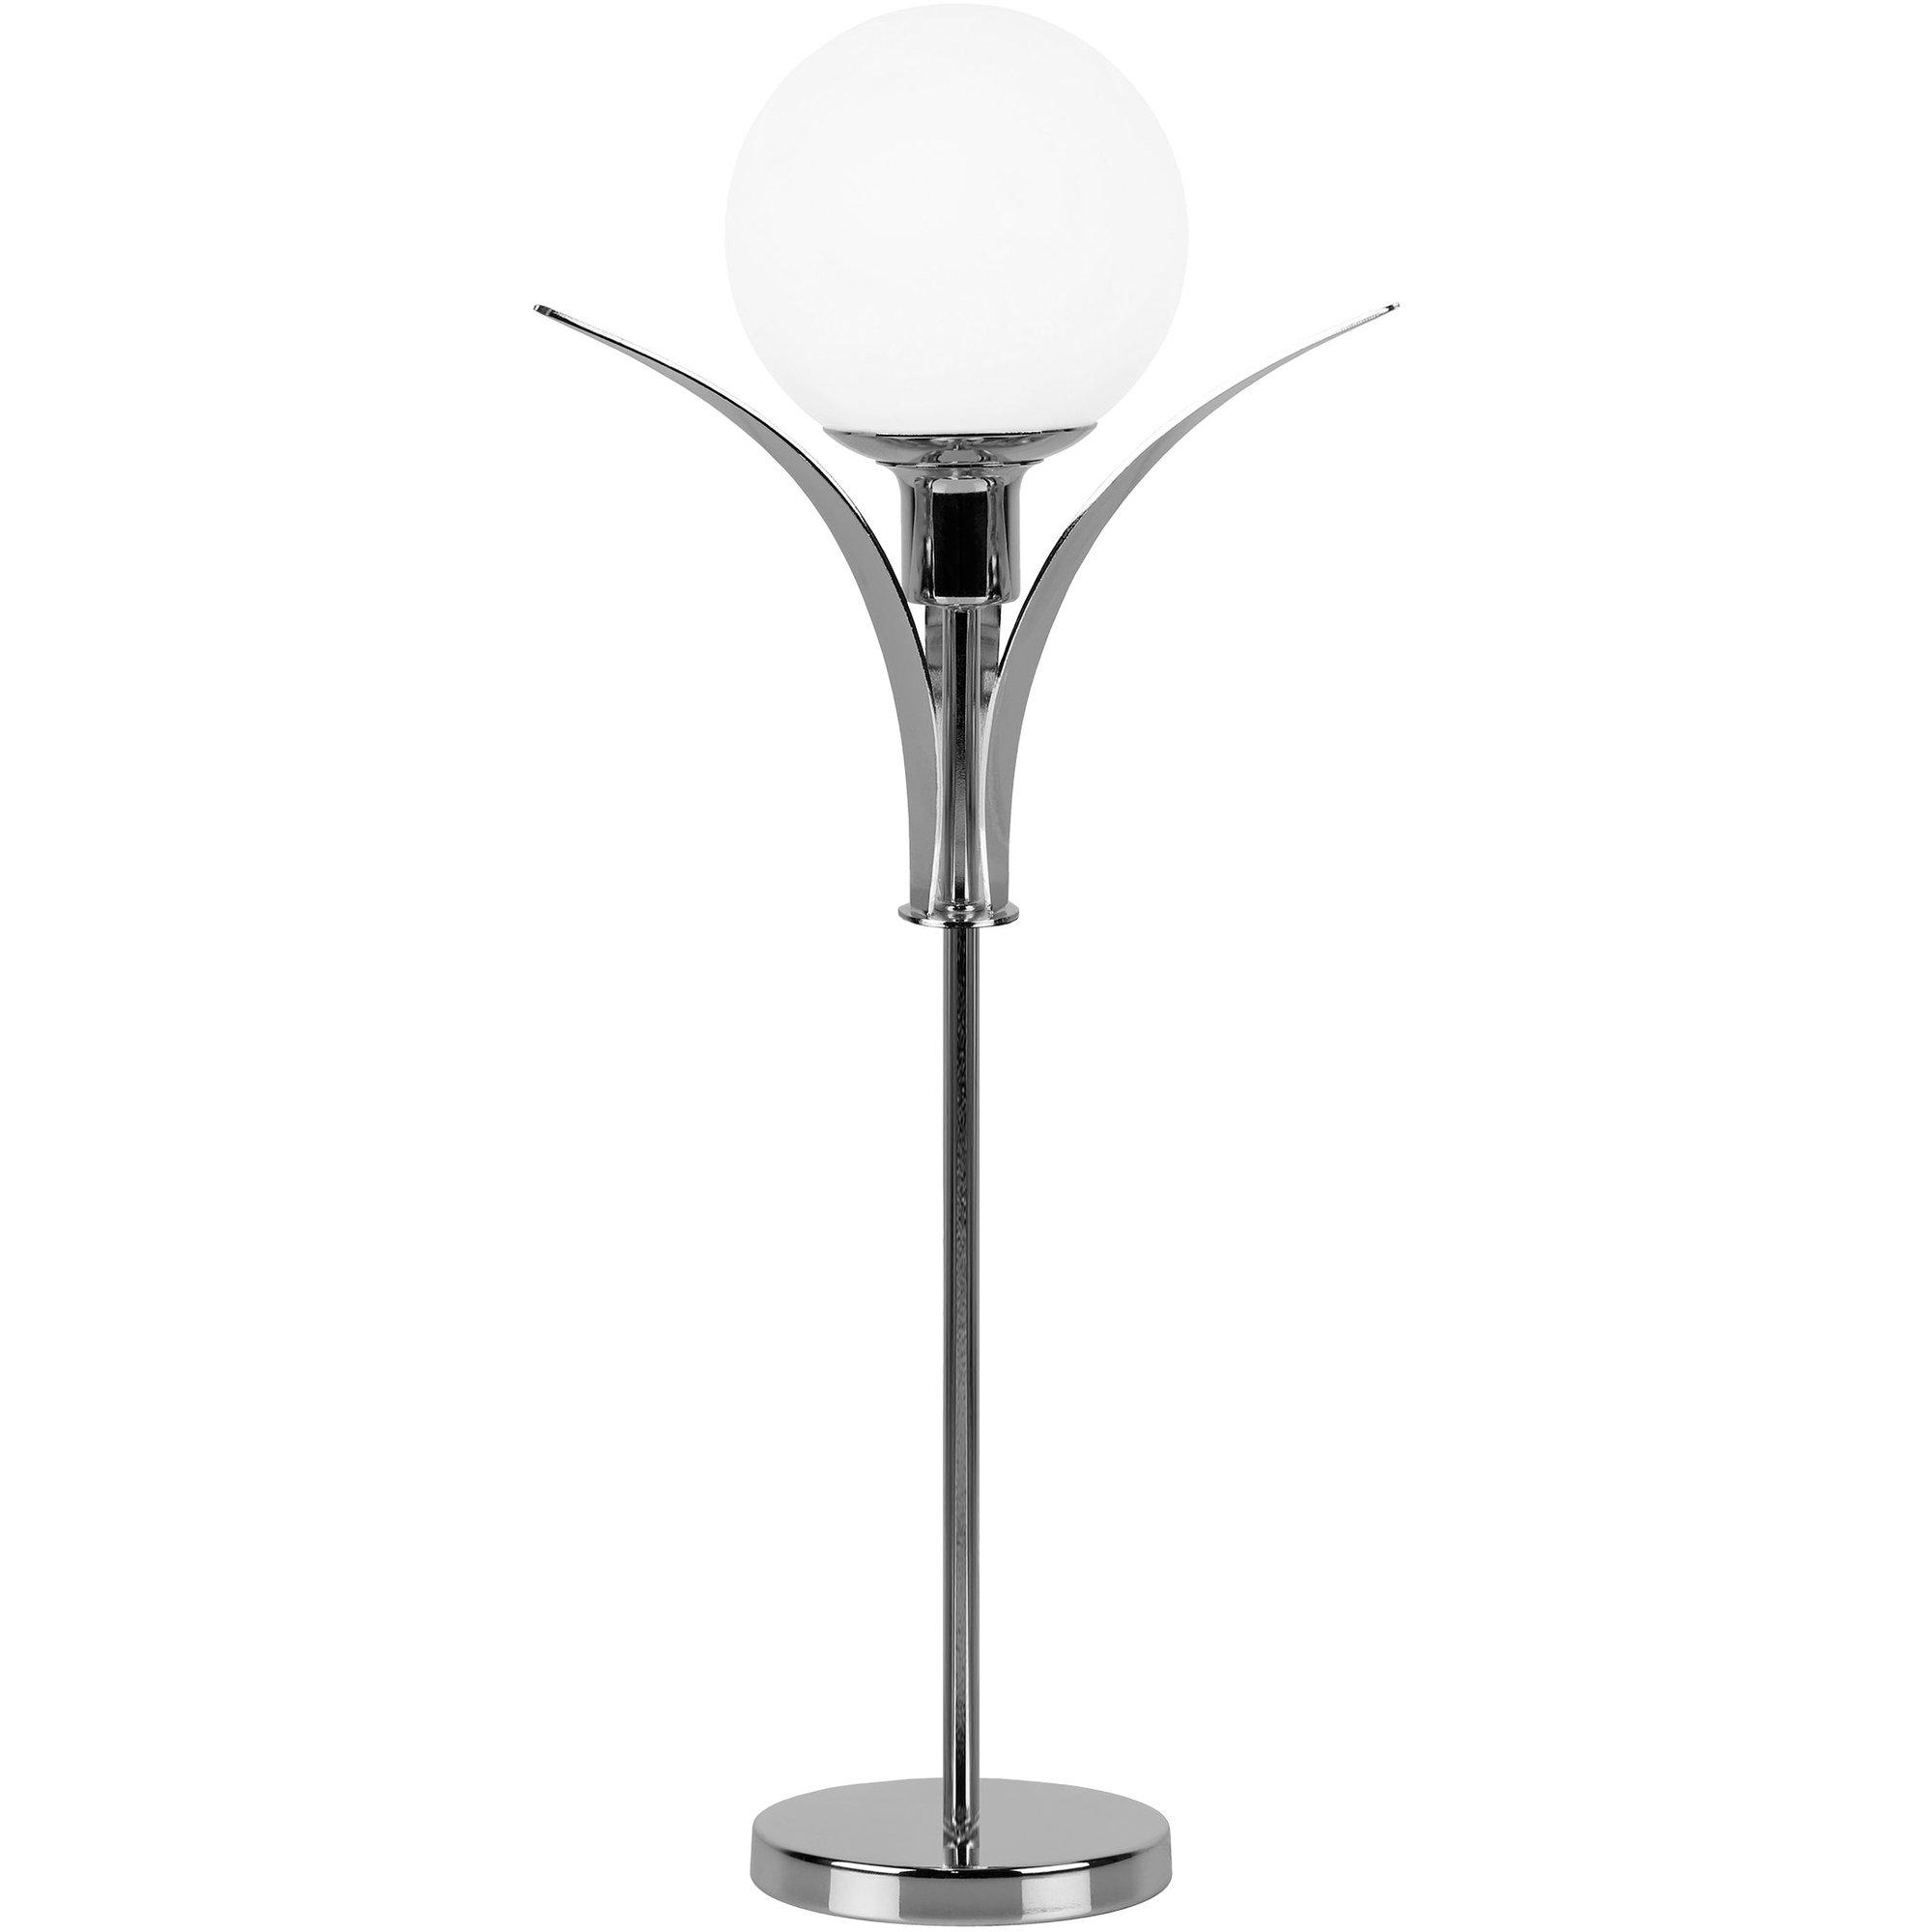 Globen Lighting Savoy High Bordslampa krom